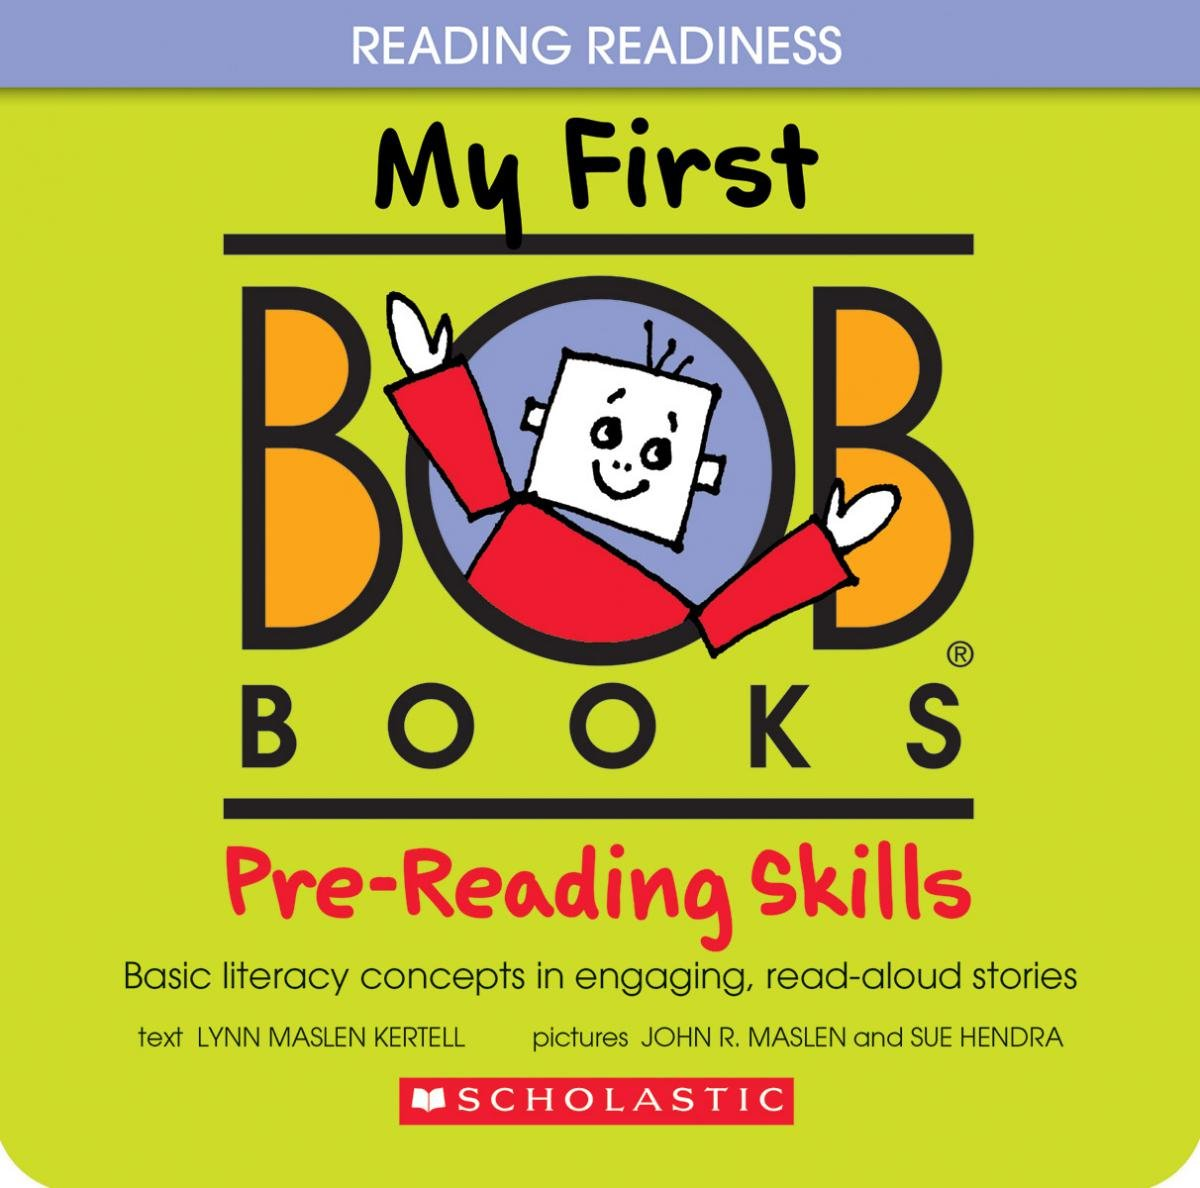 My First BOB Books: Pre-Reading Skills by Scholastic Inc.